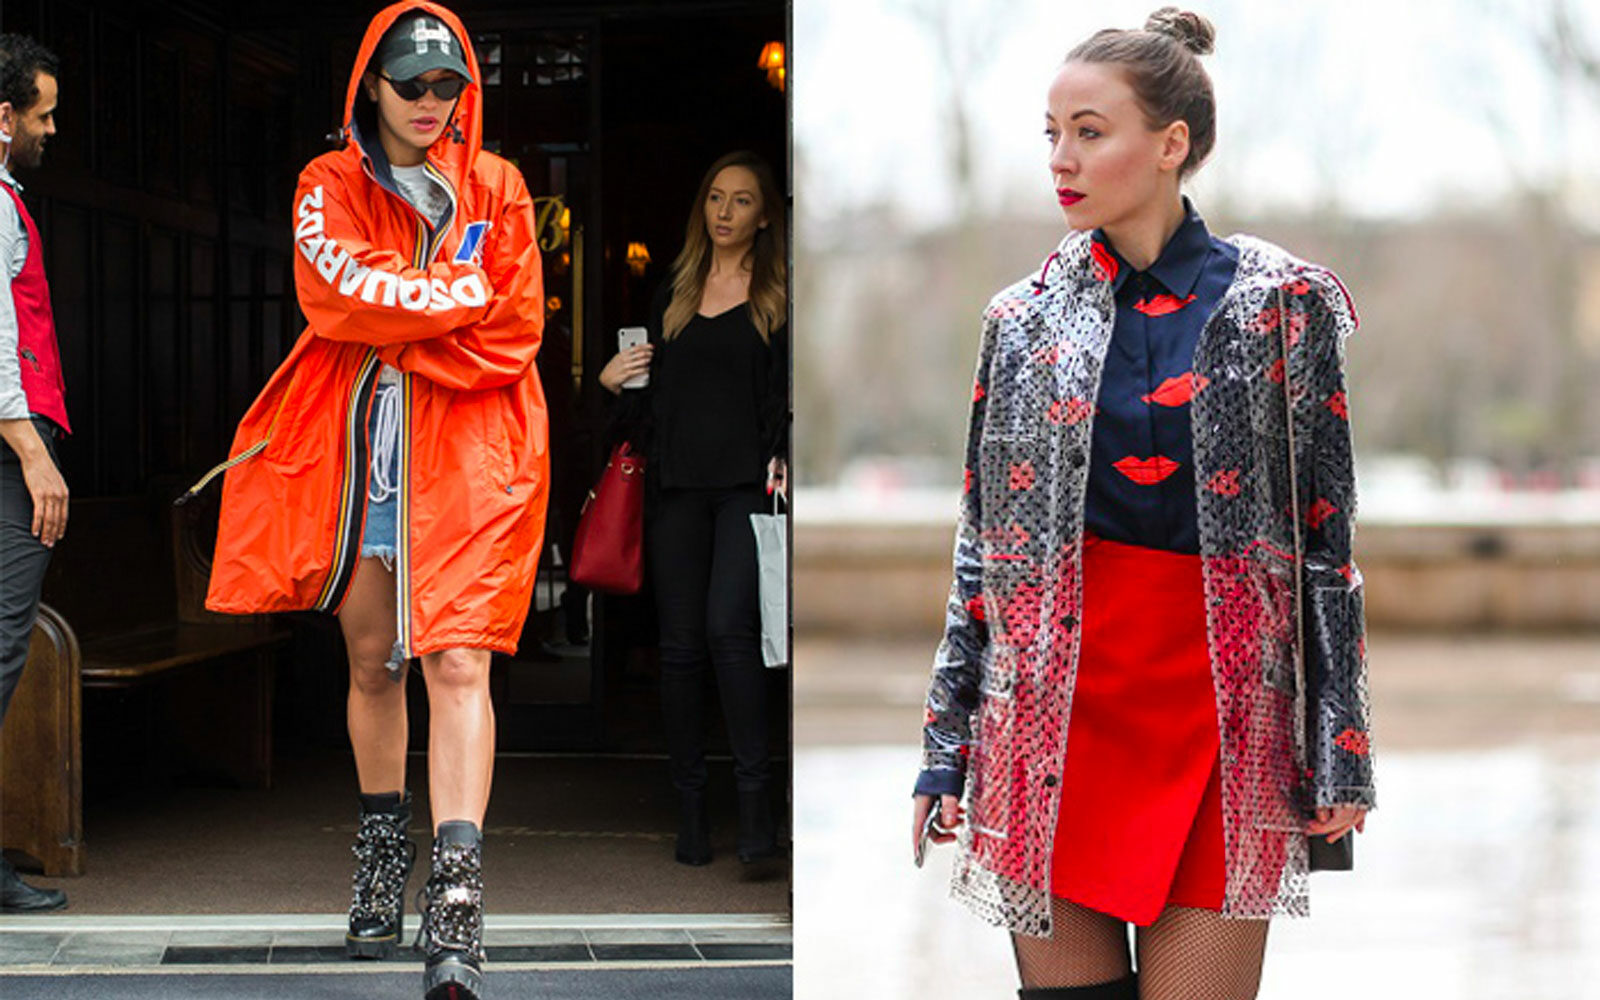 Rita Ora/Street Style